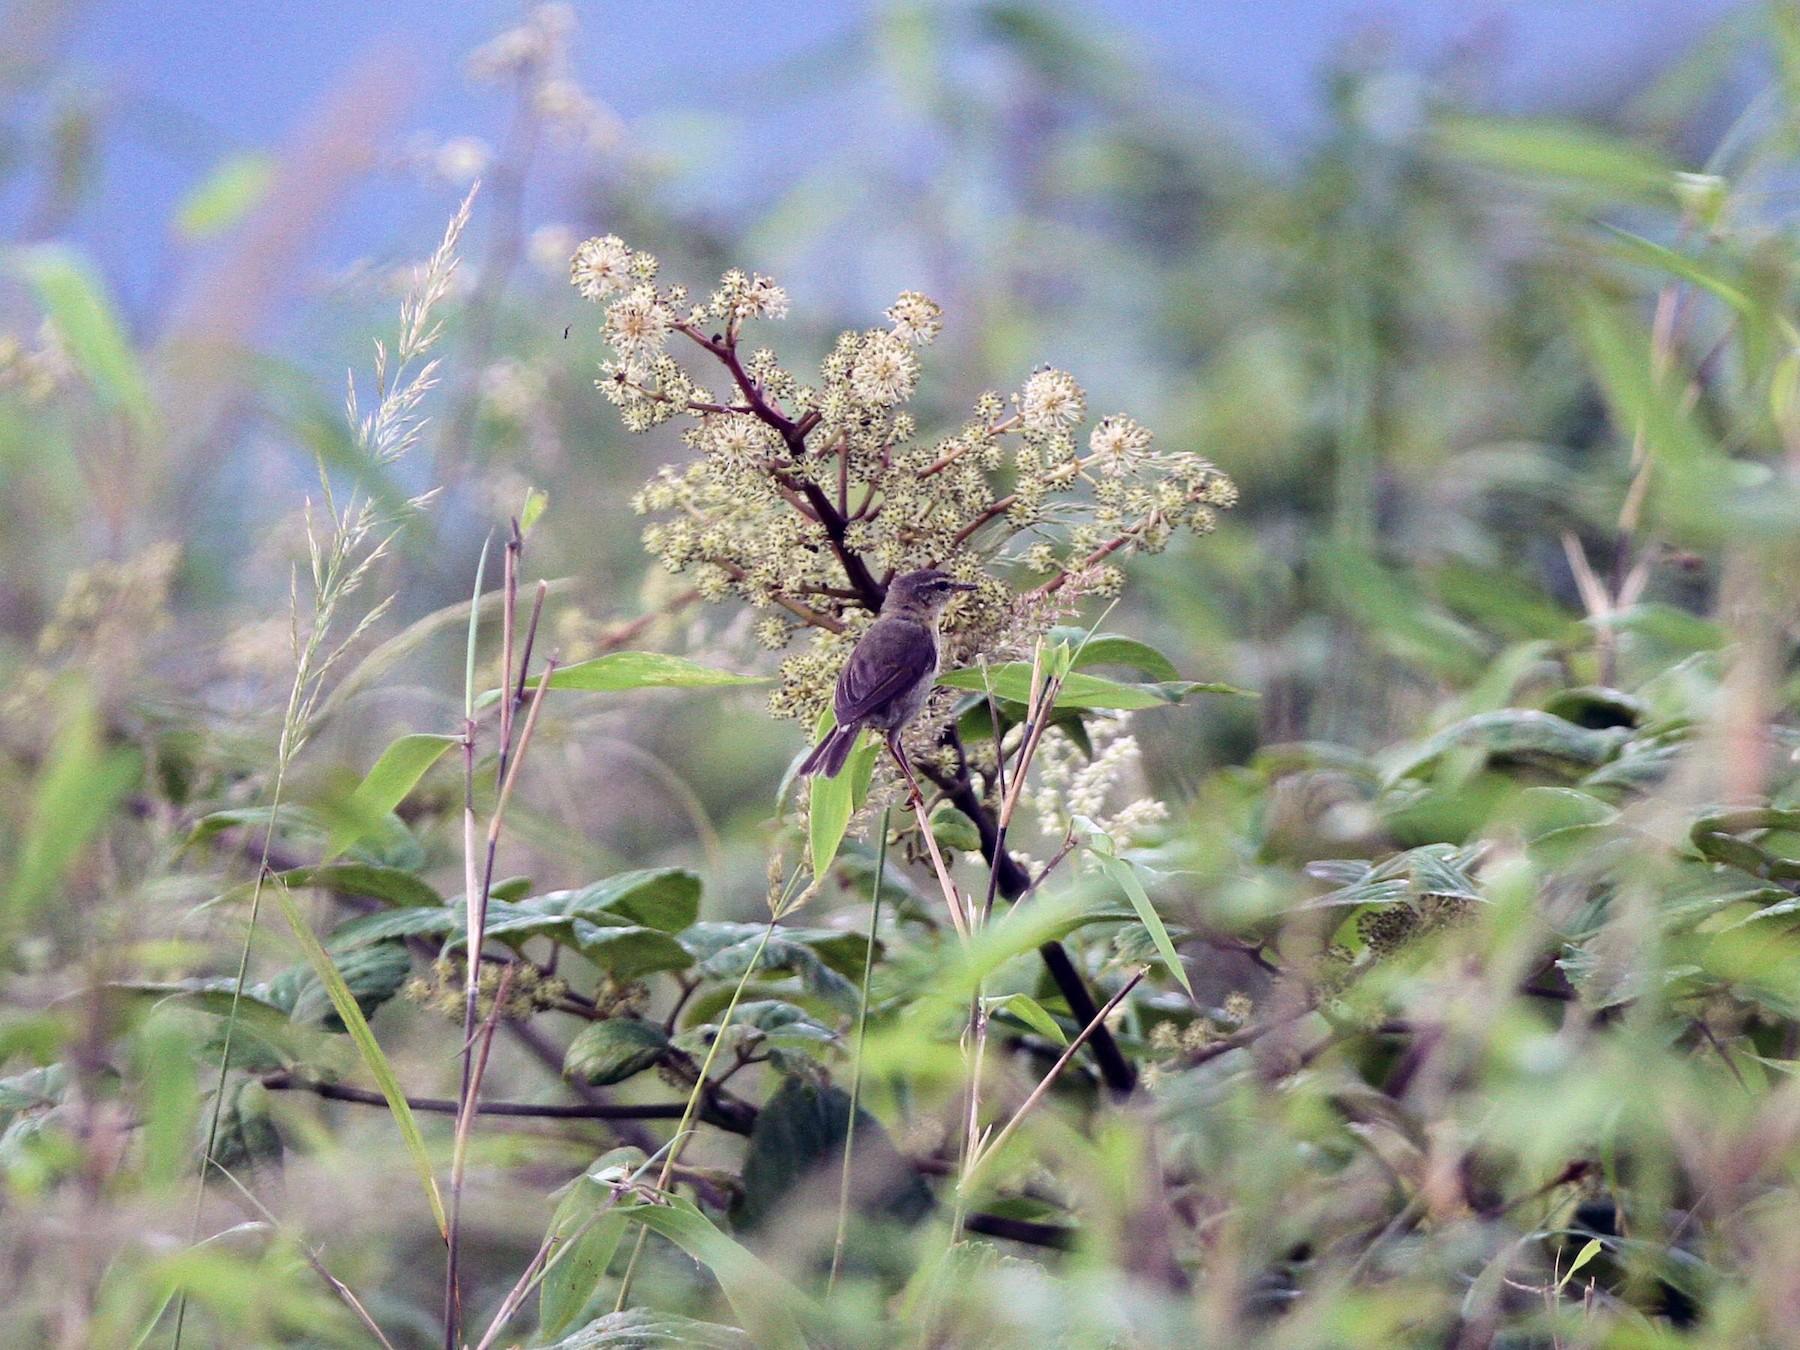 Buff-throated Warbler - Qin Huang